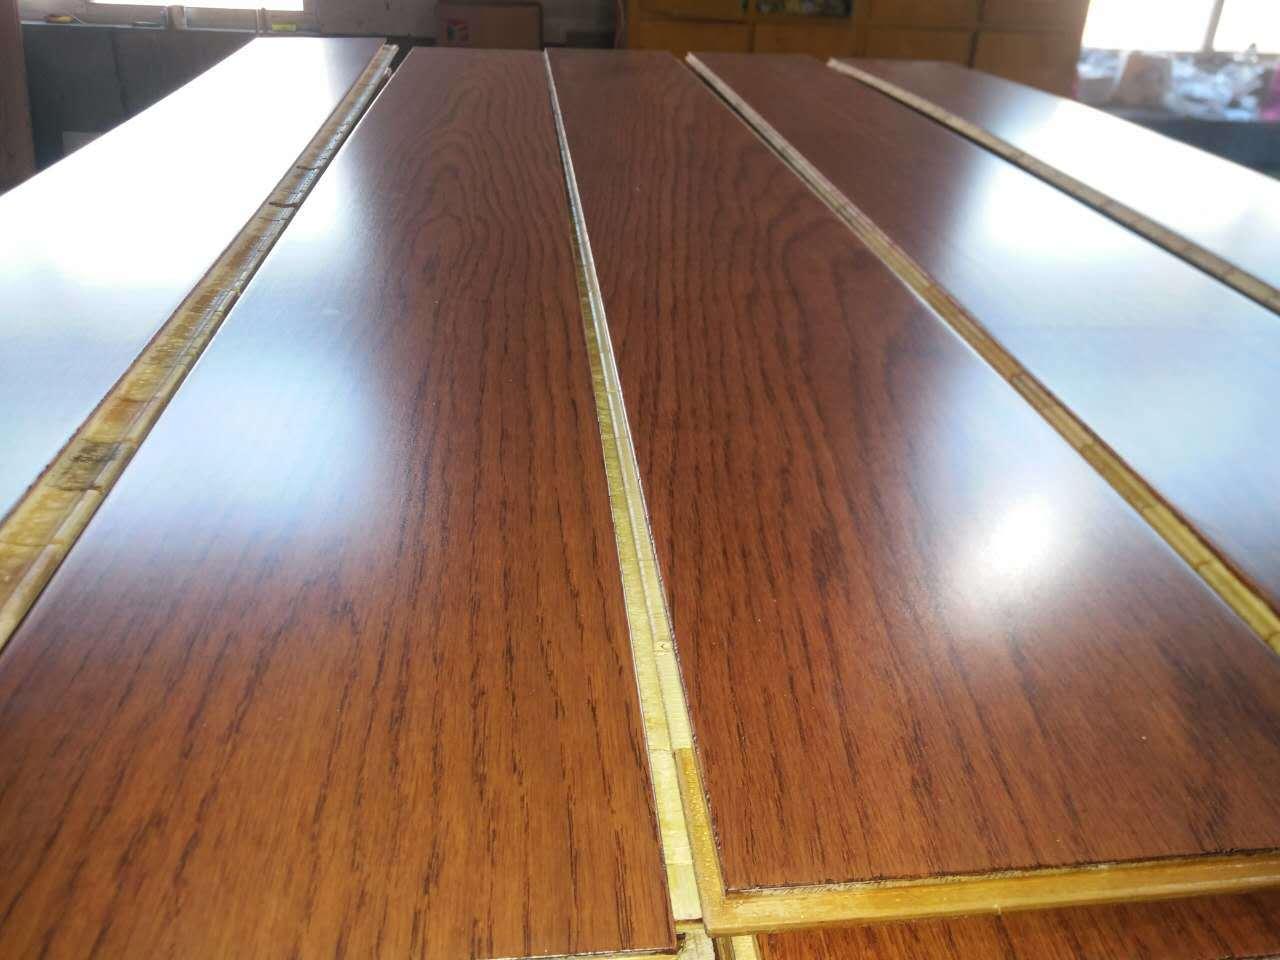 Oak Solid Wood Flooring With Uv Coating